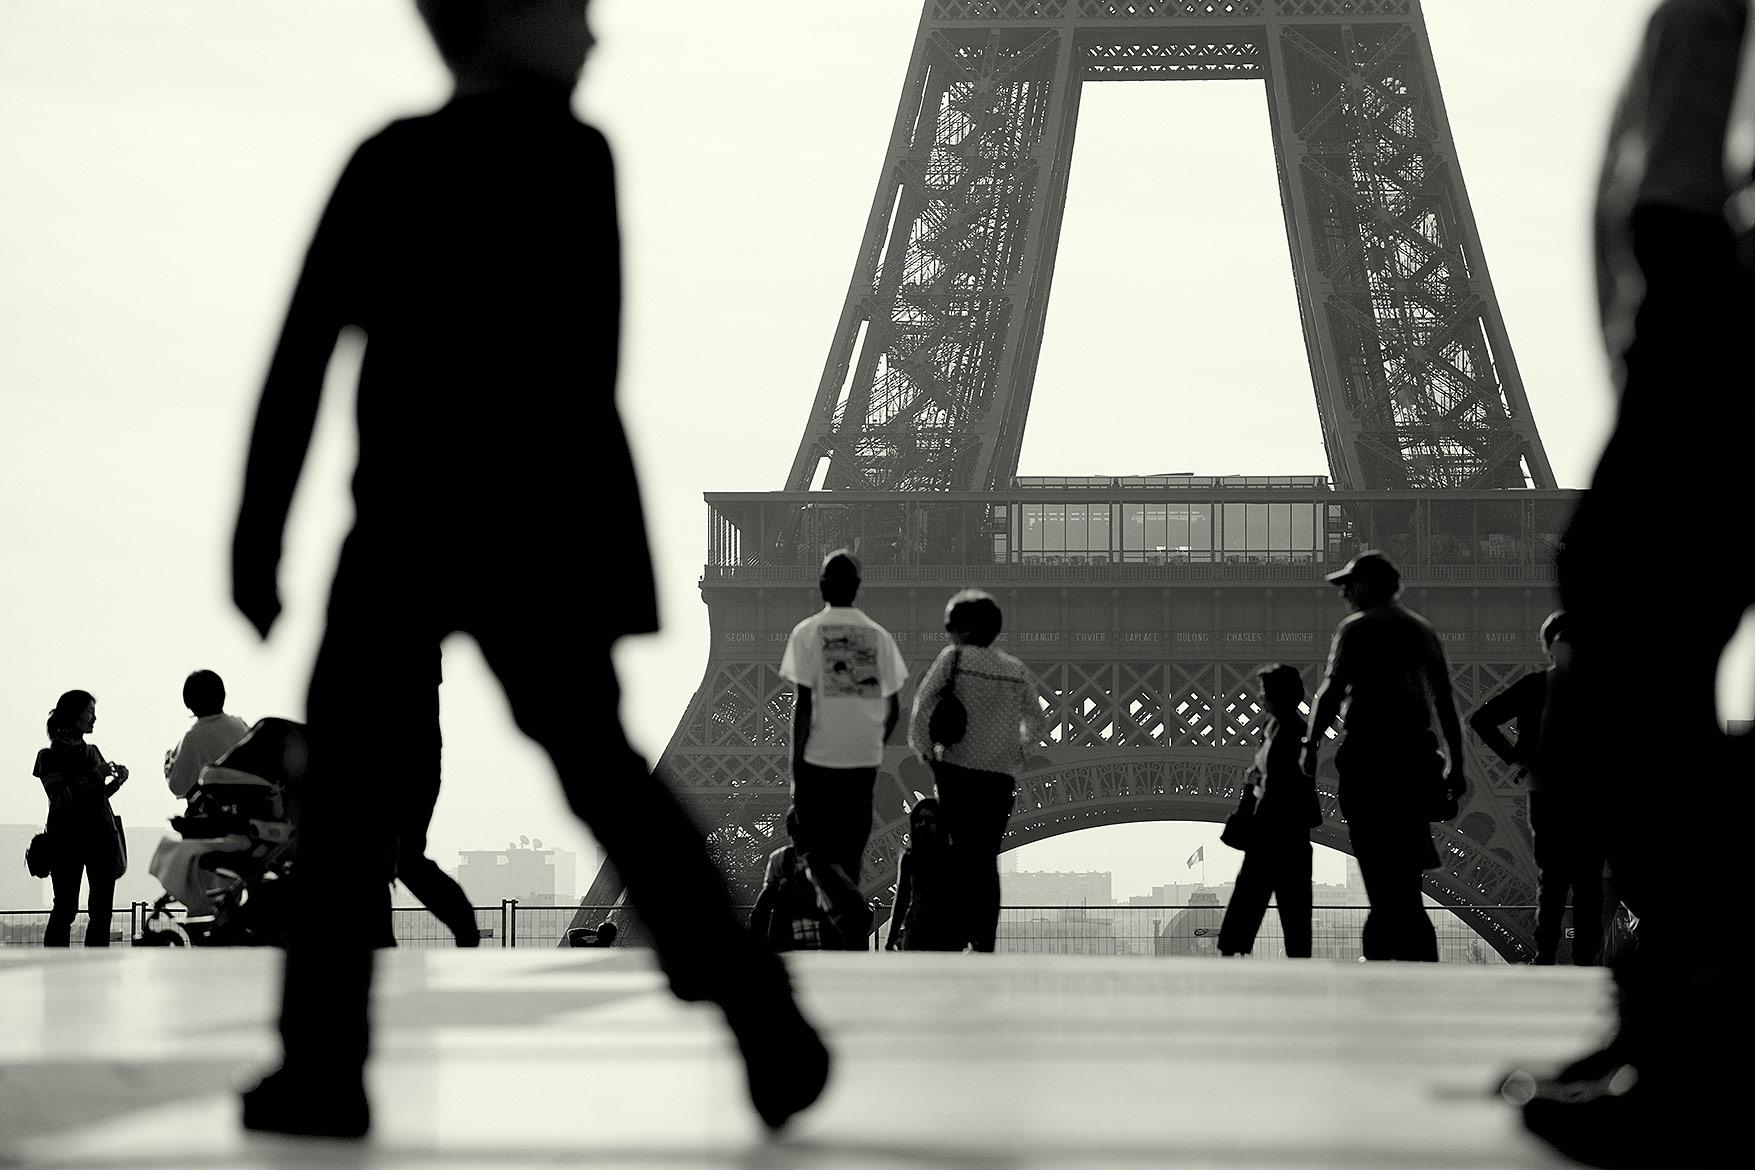 Easton_Paris_02.jpg